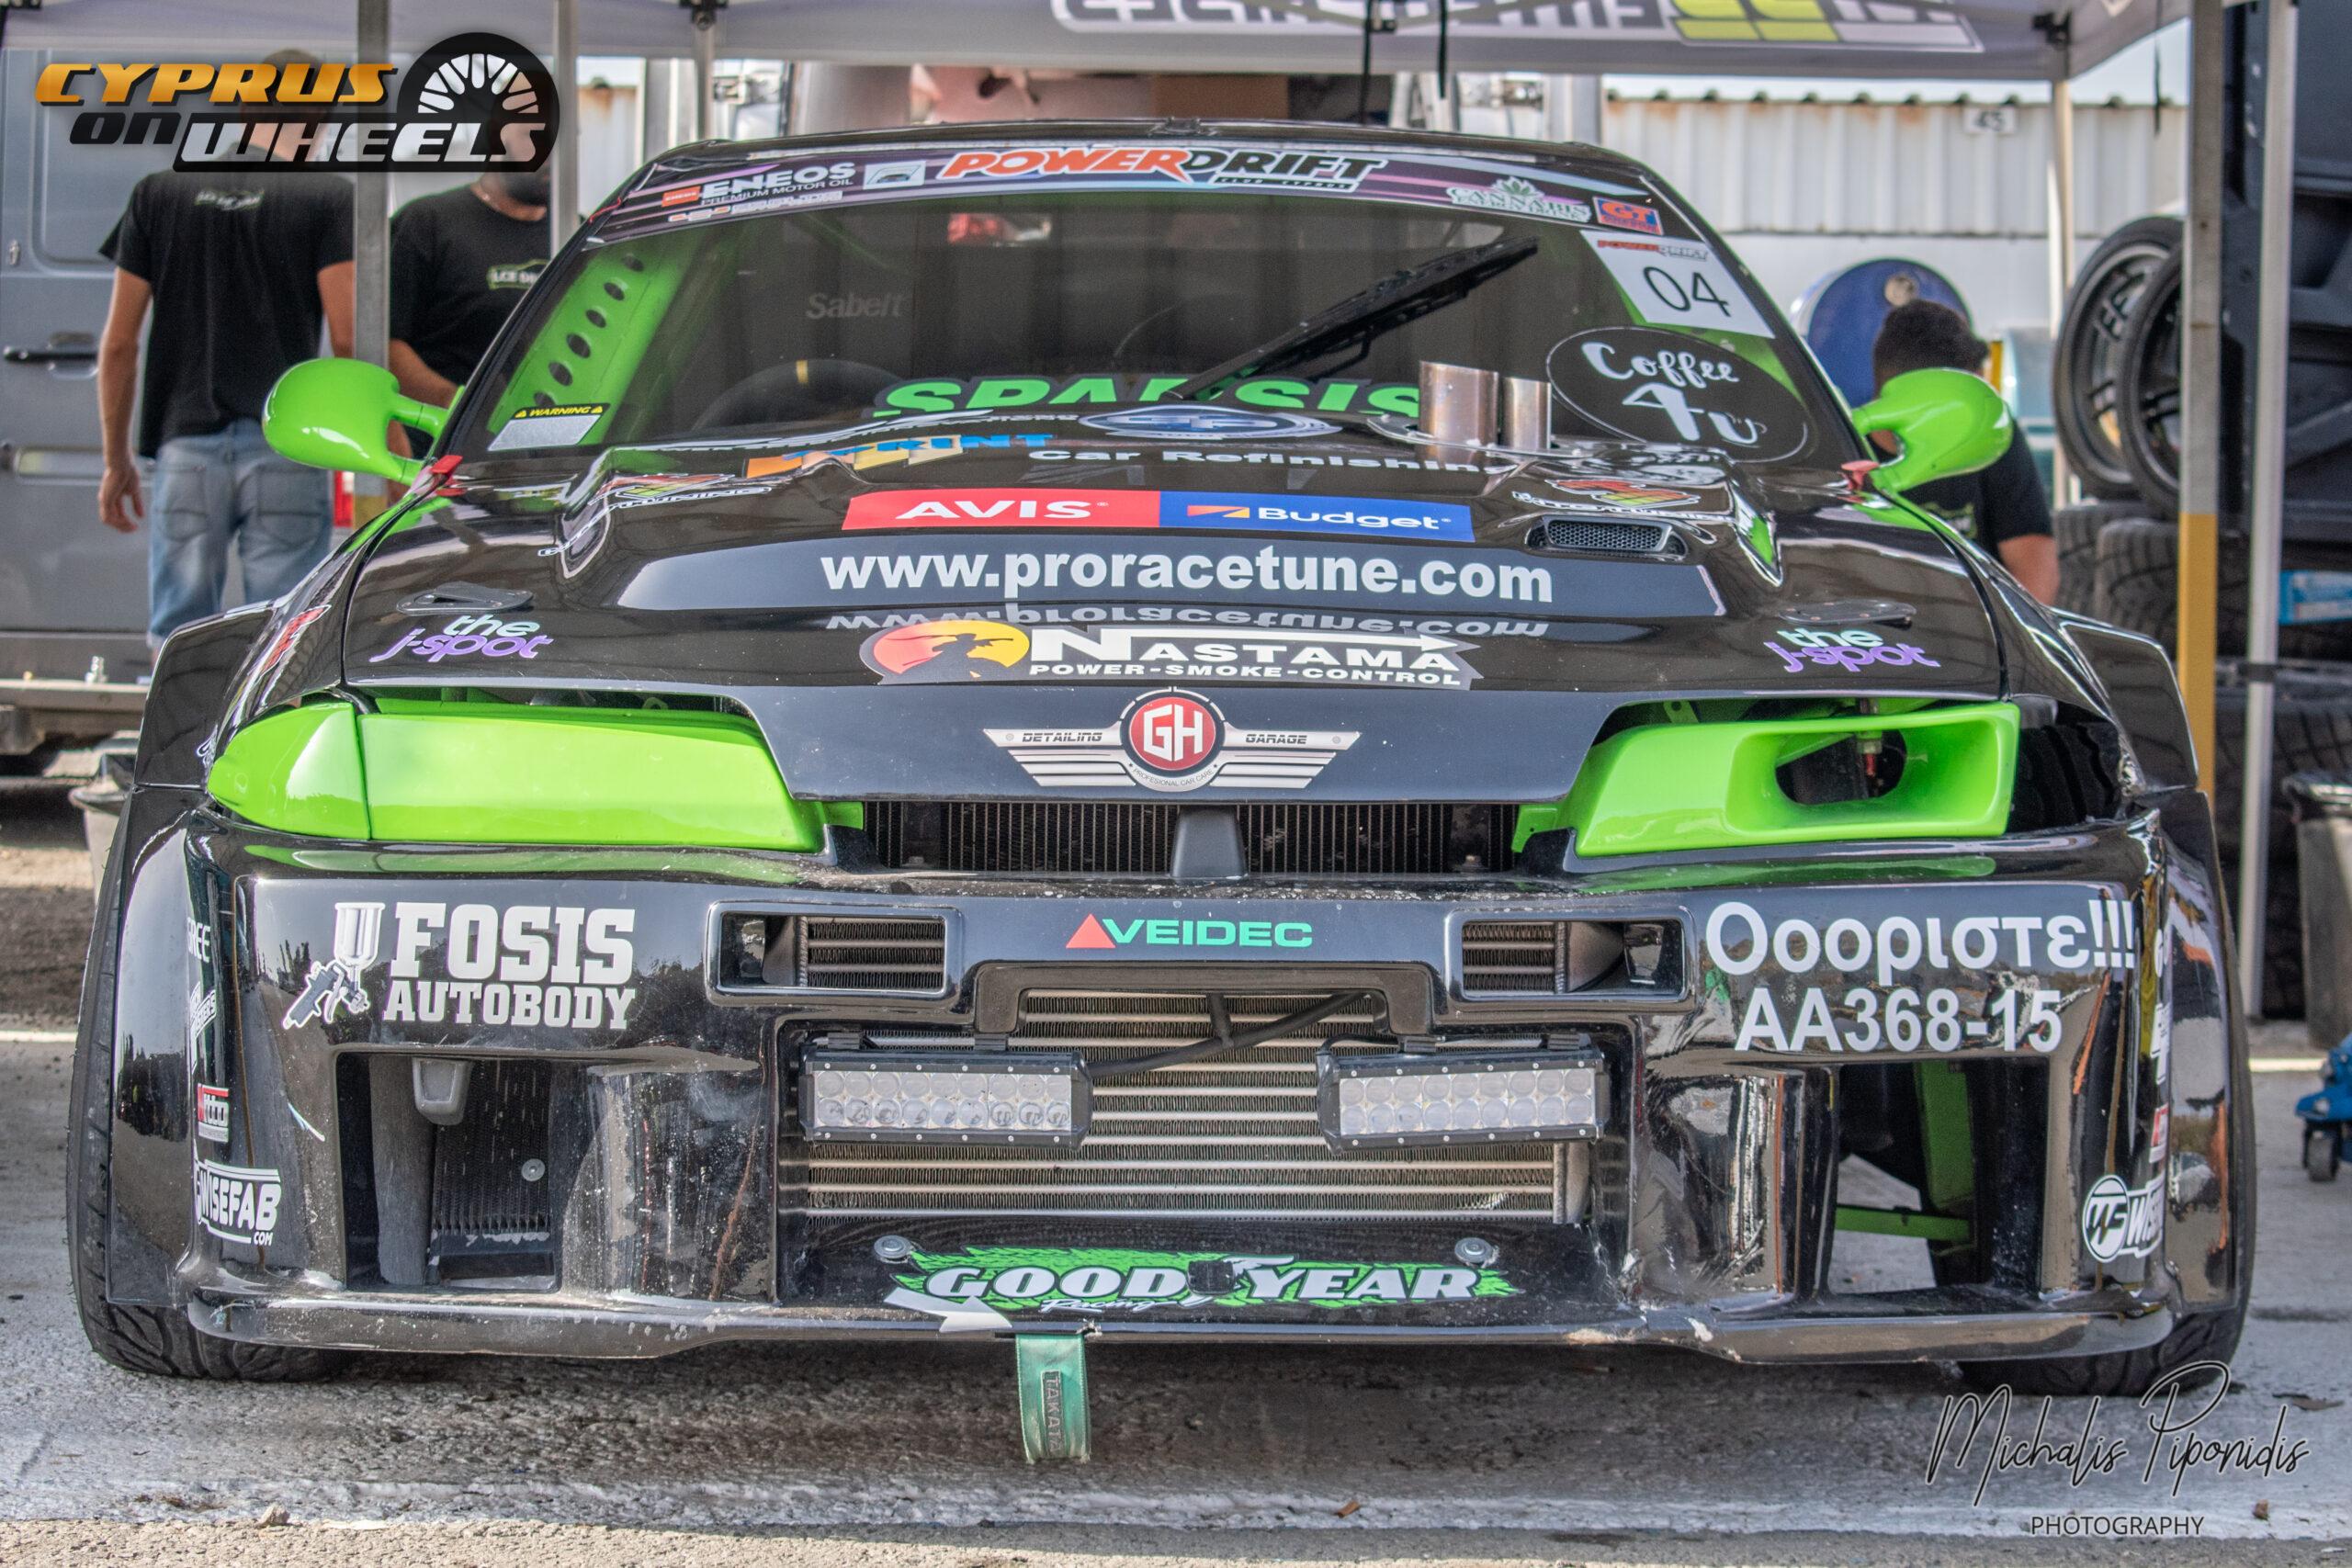 Double drift race